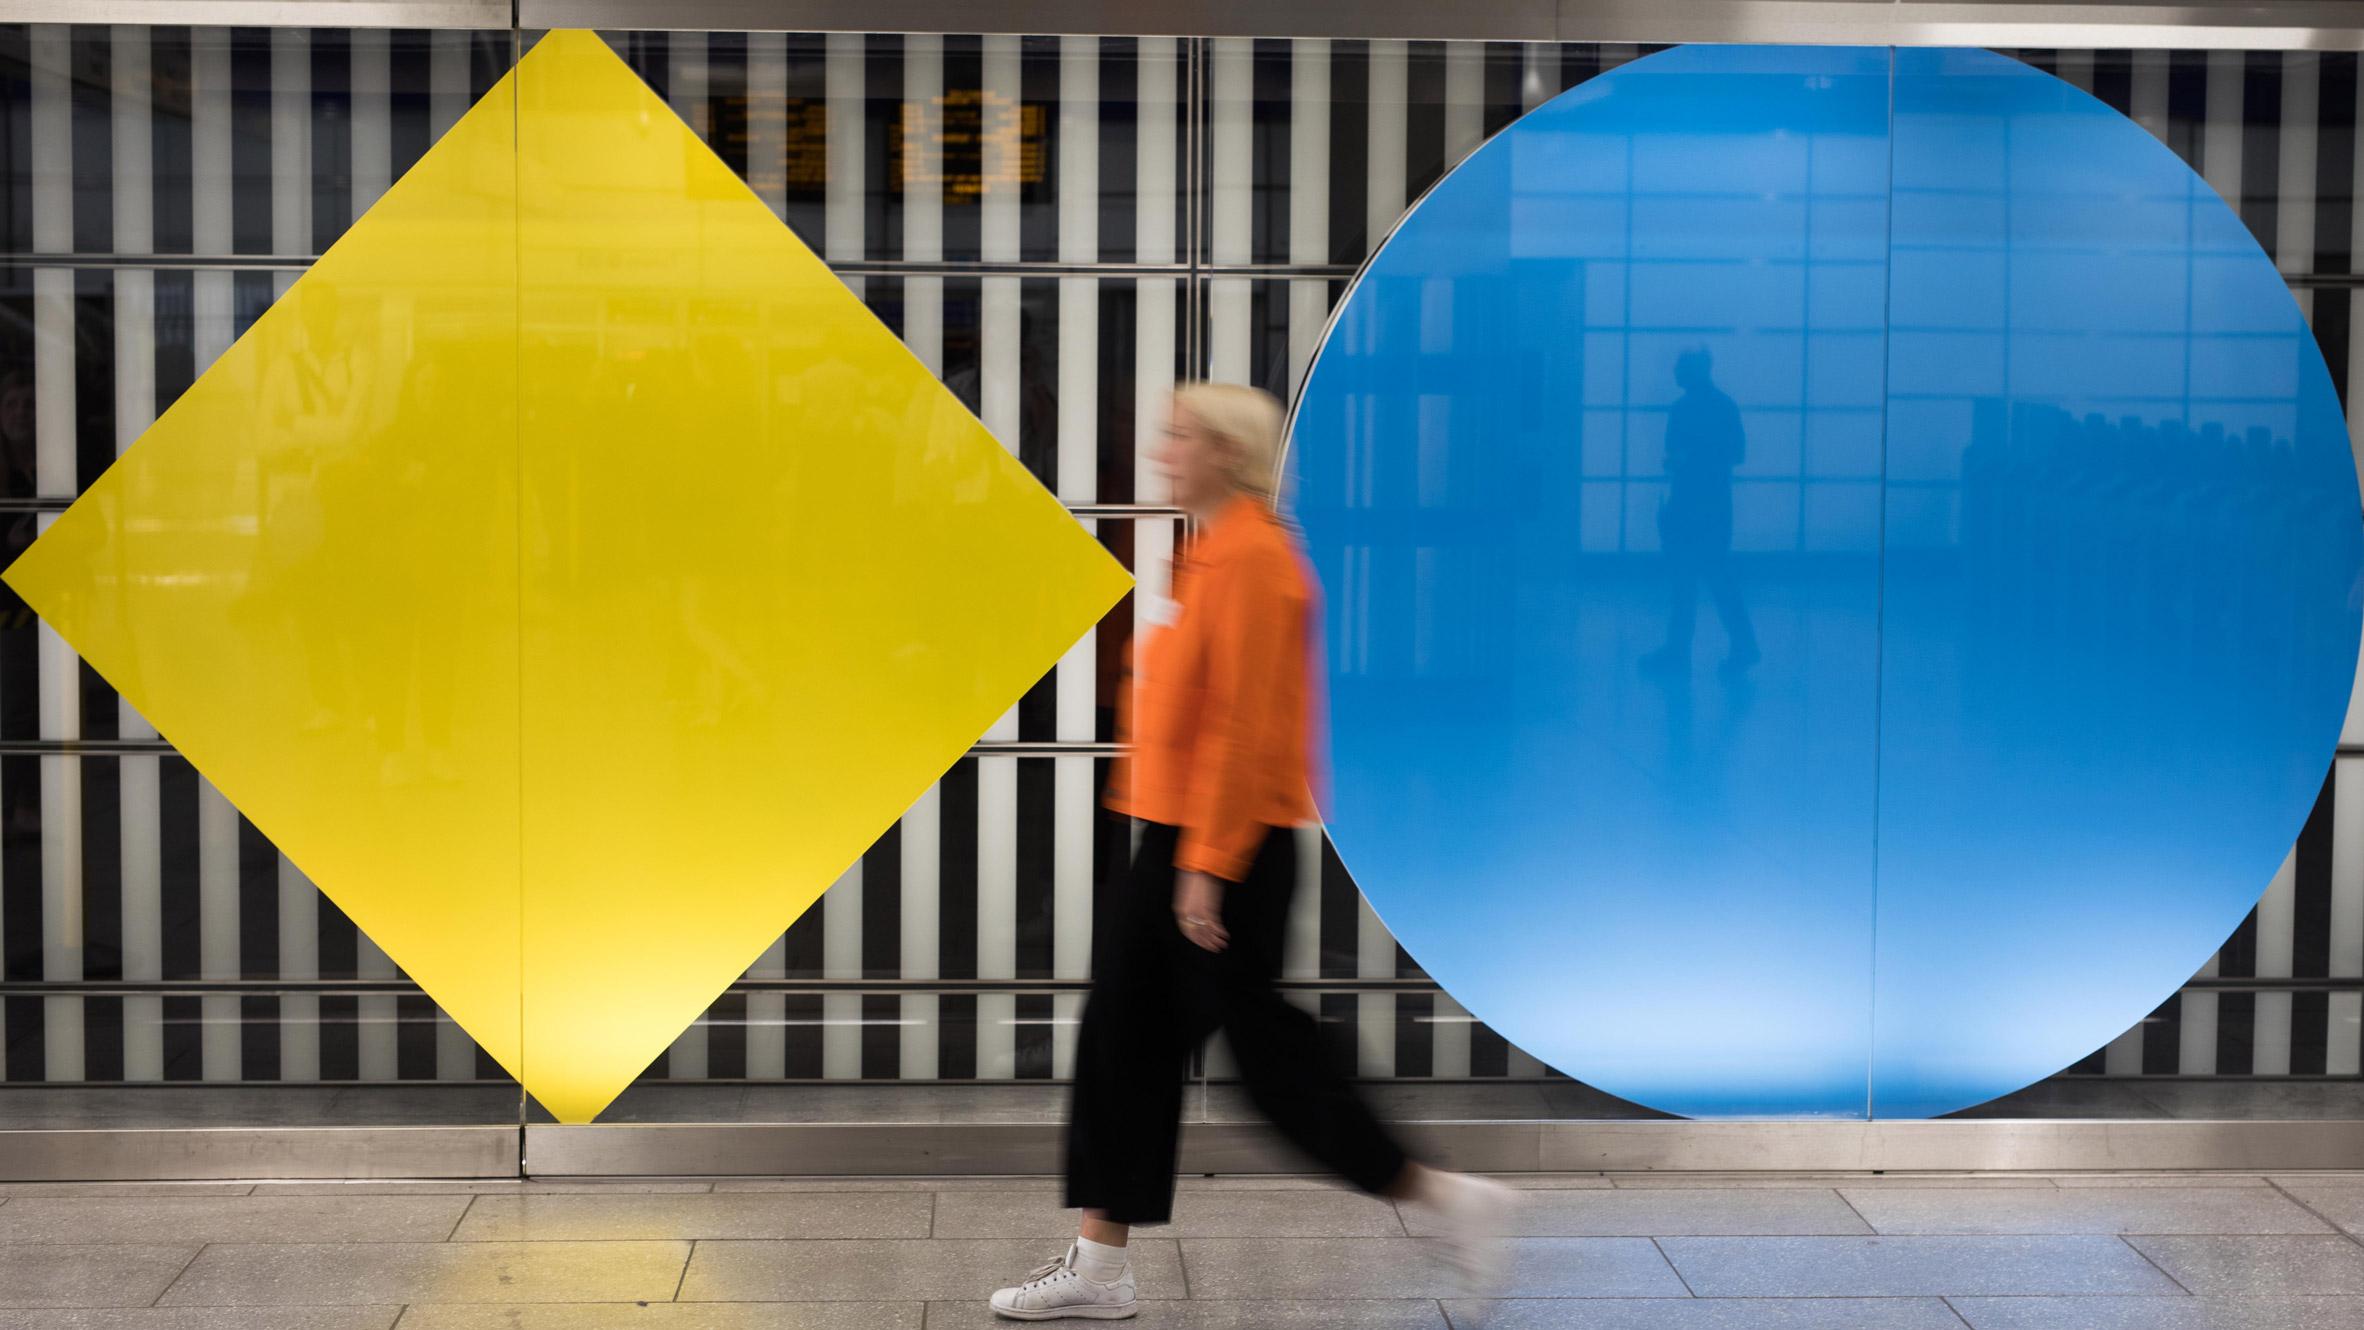 Daniel Buren Completes Installation At Tottenham Court Road Tube Station